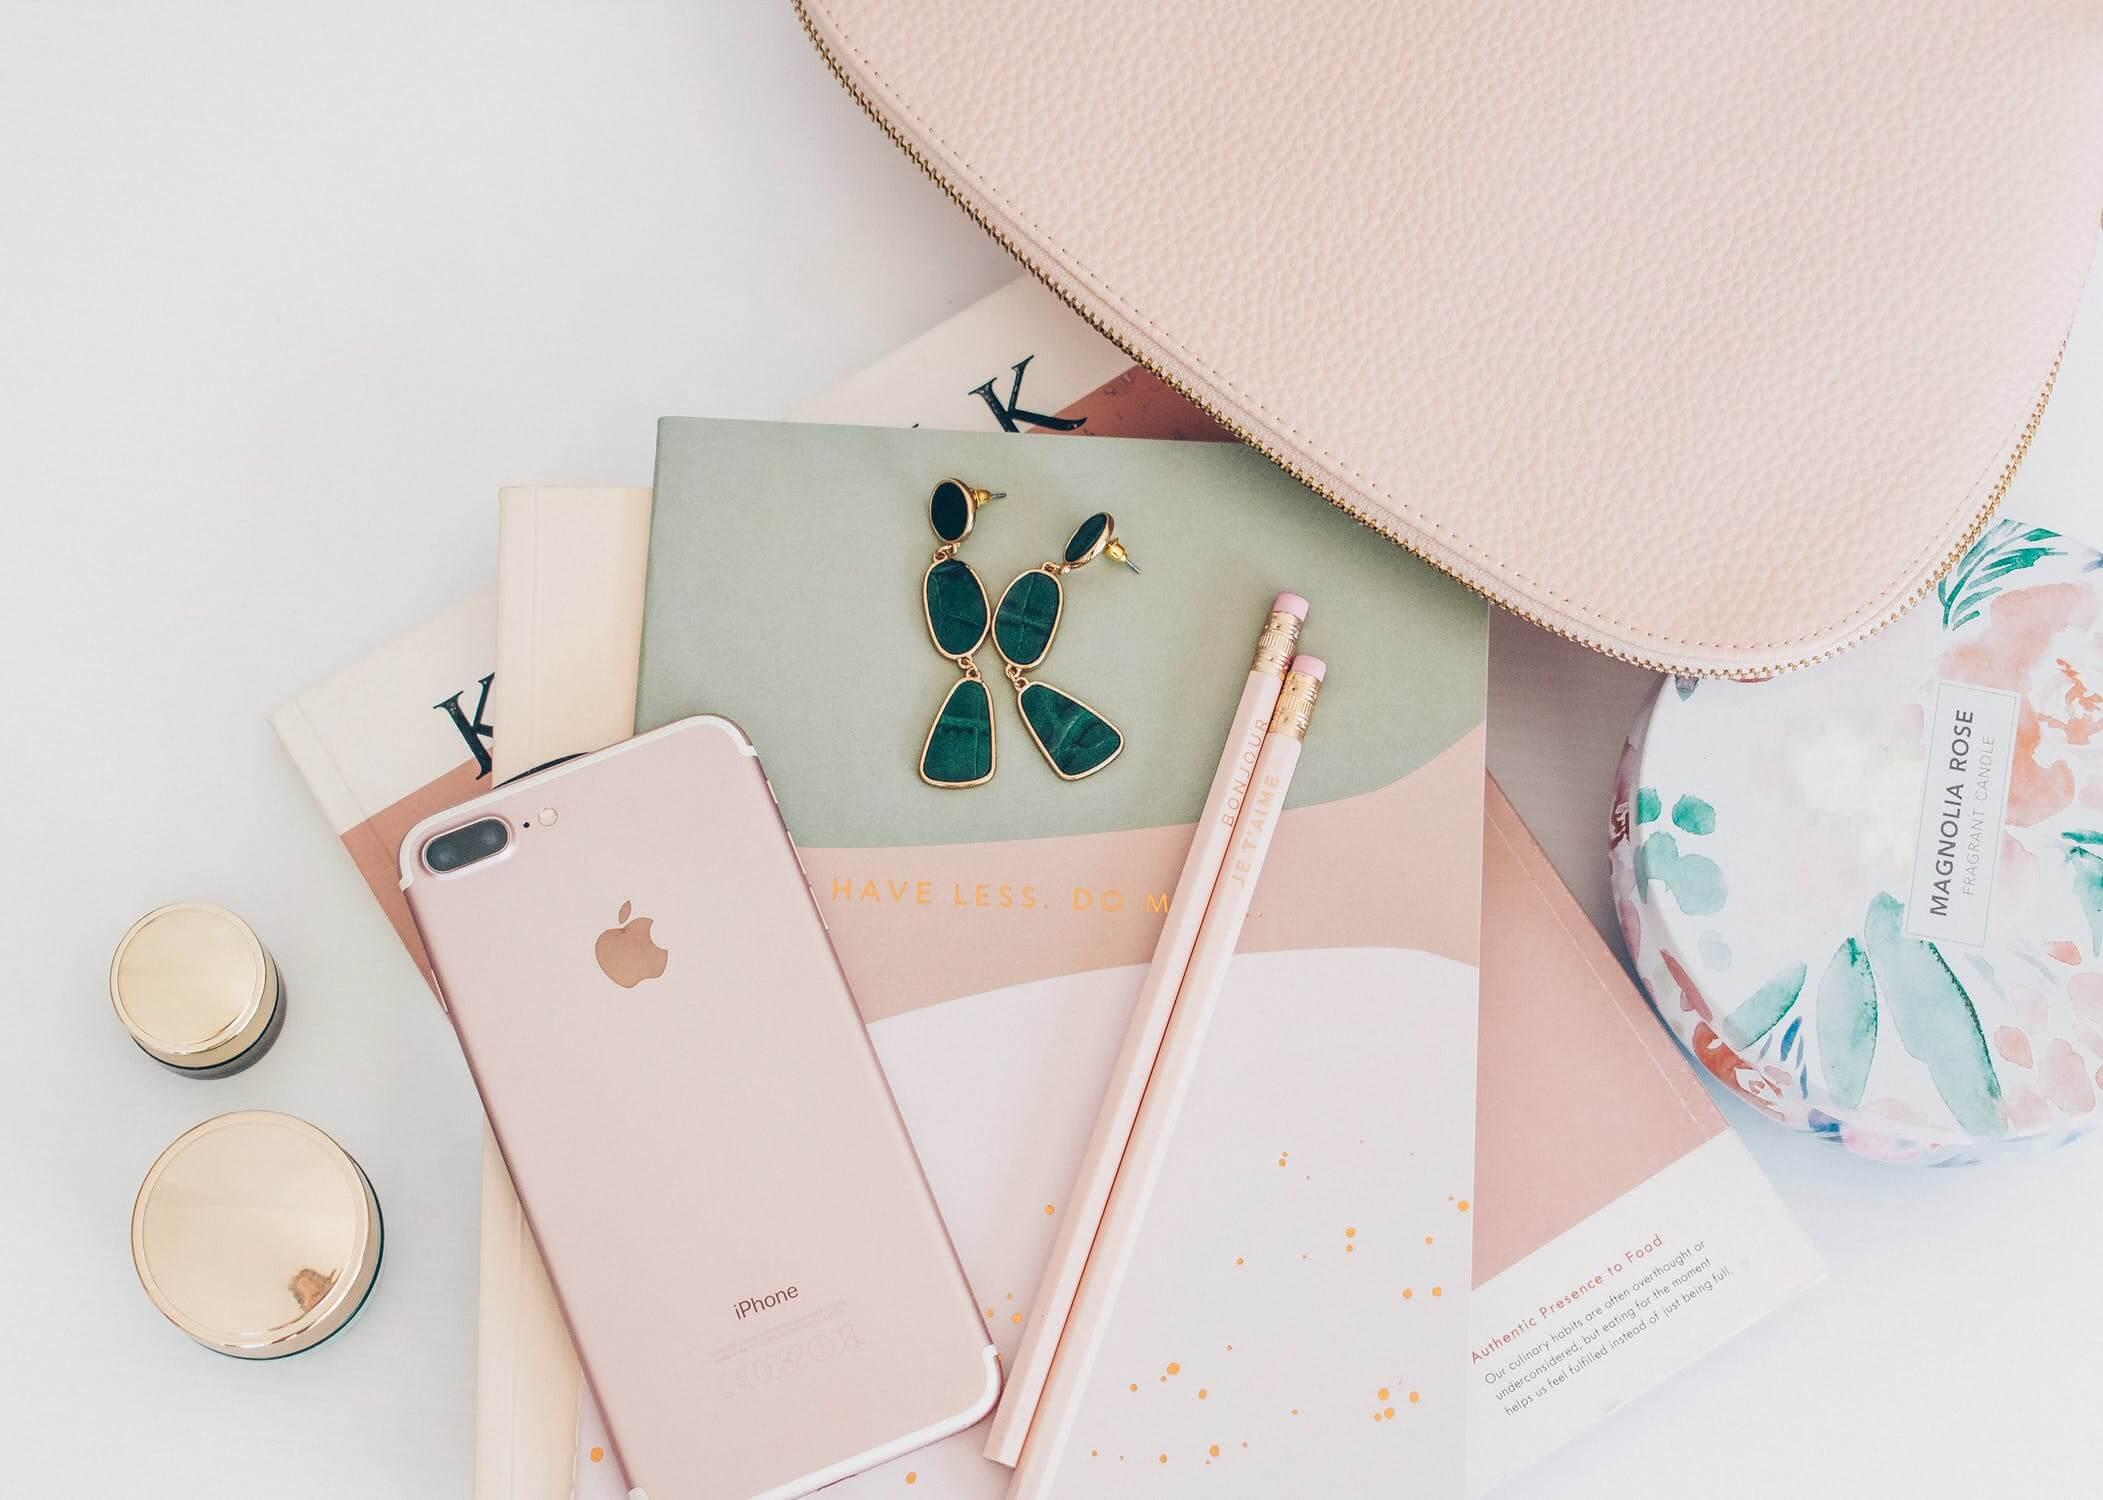 Rose Color Accessories